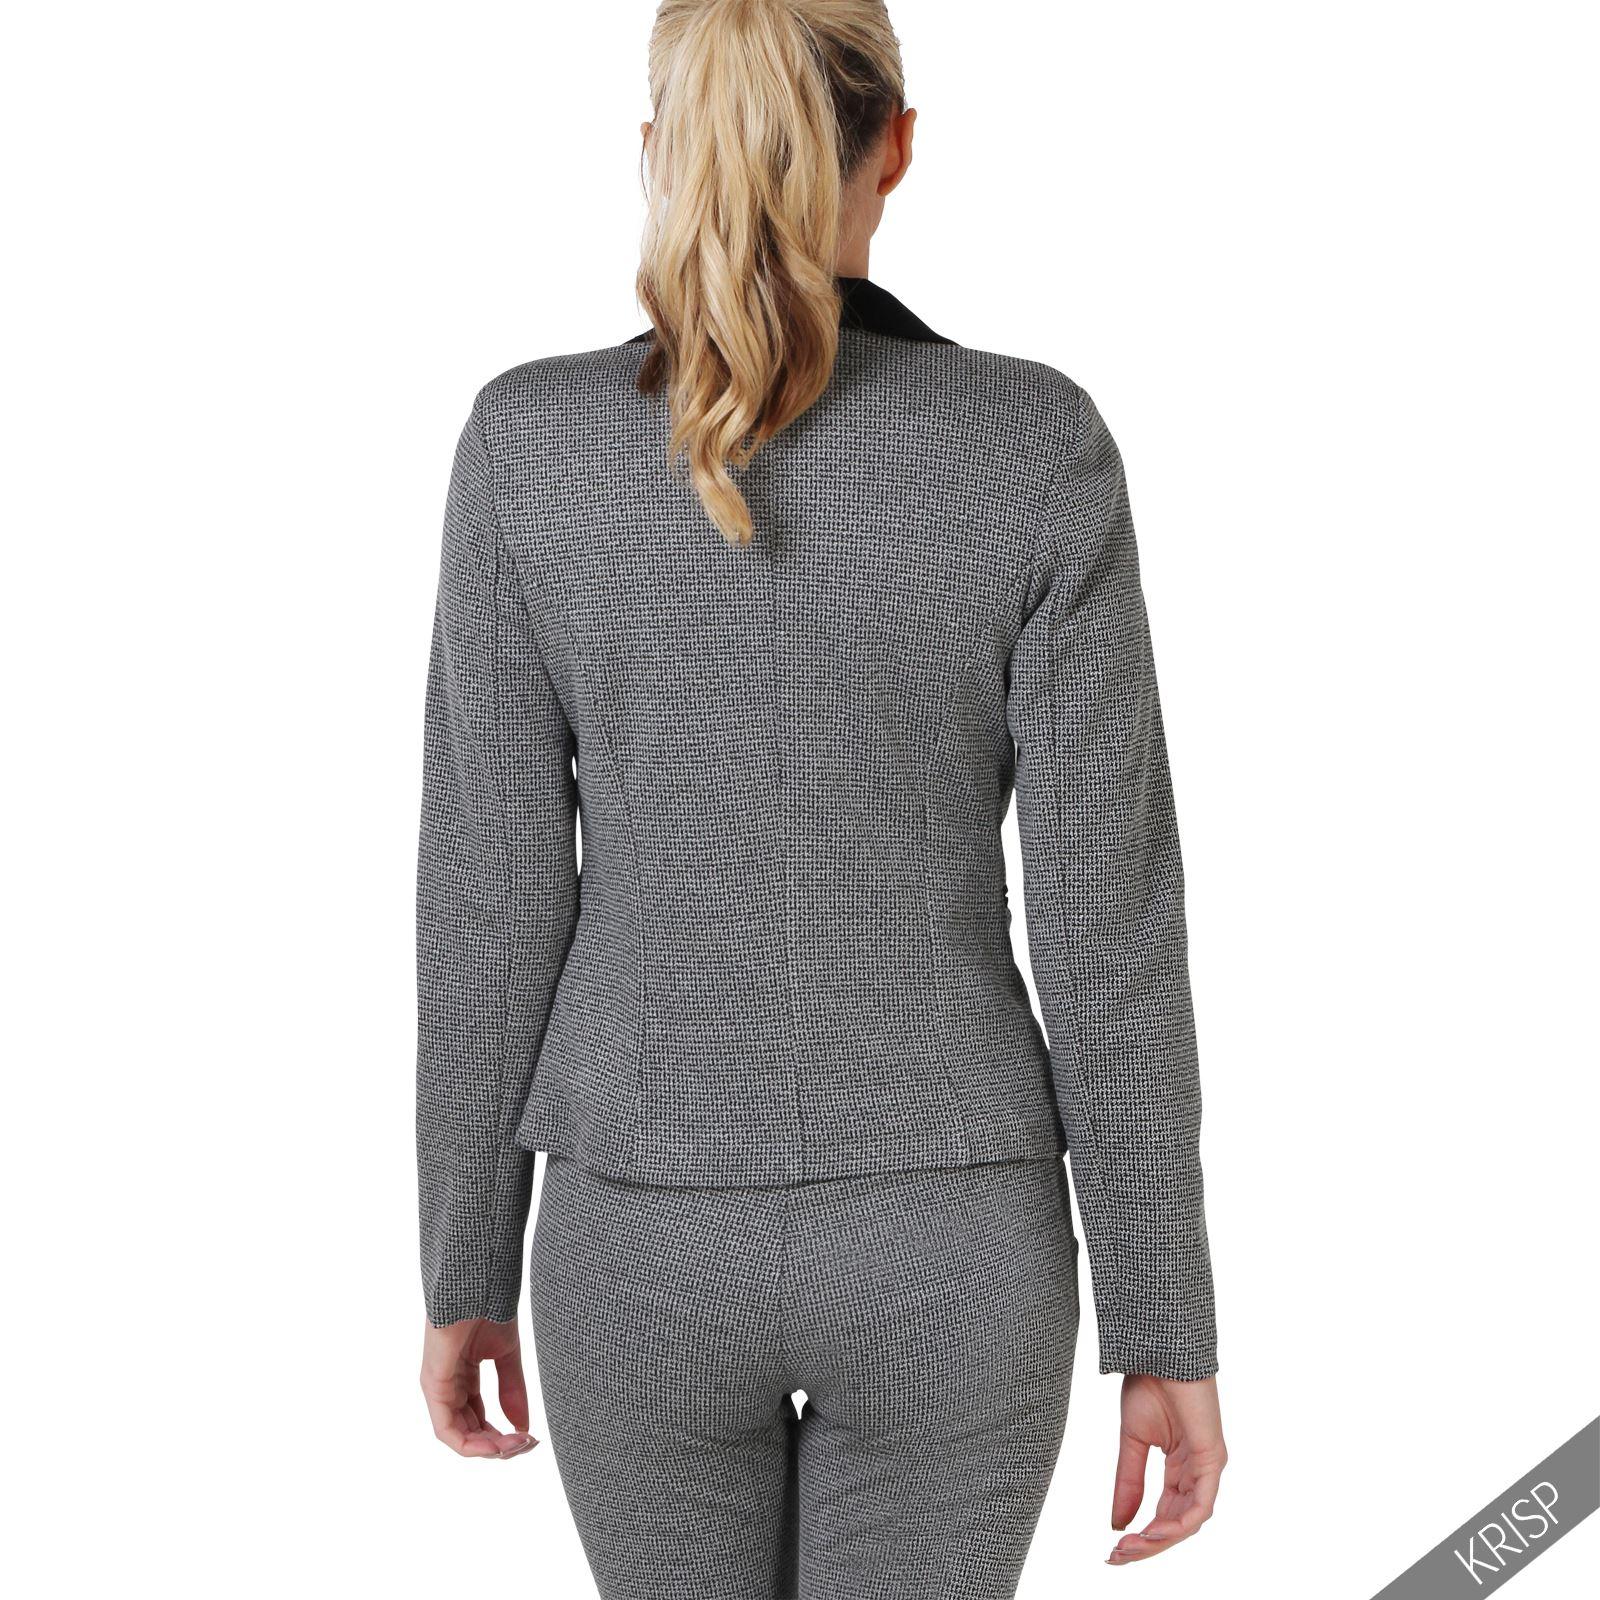 damen business hosenanzug eleganter blazer graue slim fit. Black Bedroom Furniture Sets. Home Design Ideas